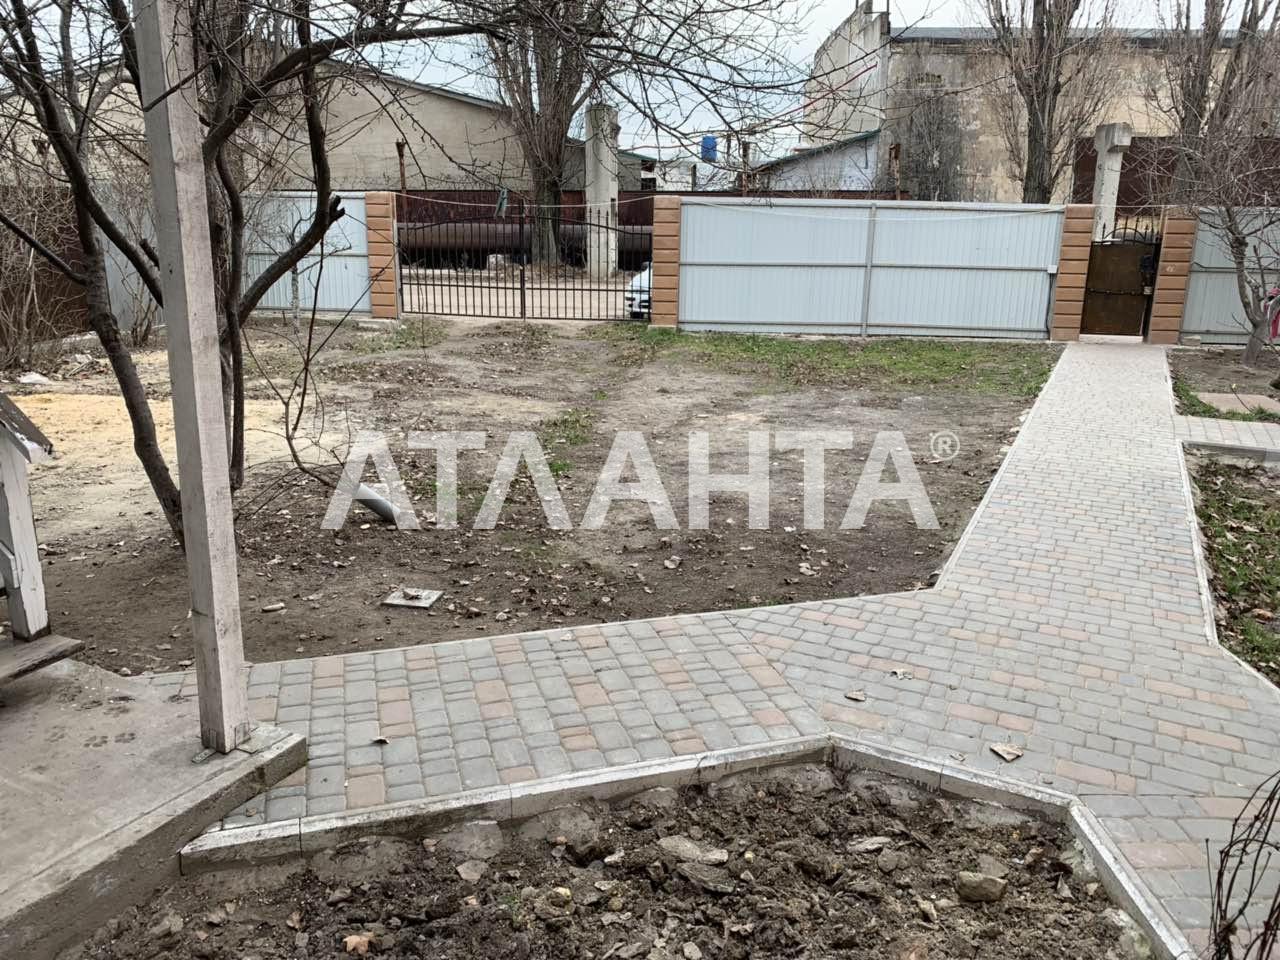 Продается 1-комнатная Квартира на ул. Балтская Дор. — 20 000 у.е. (фото №11)